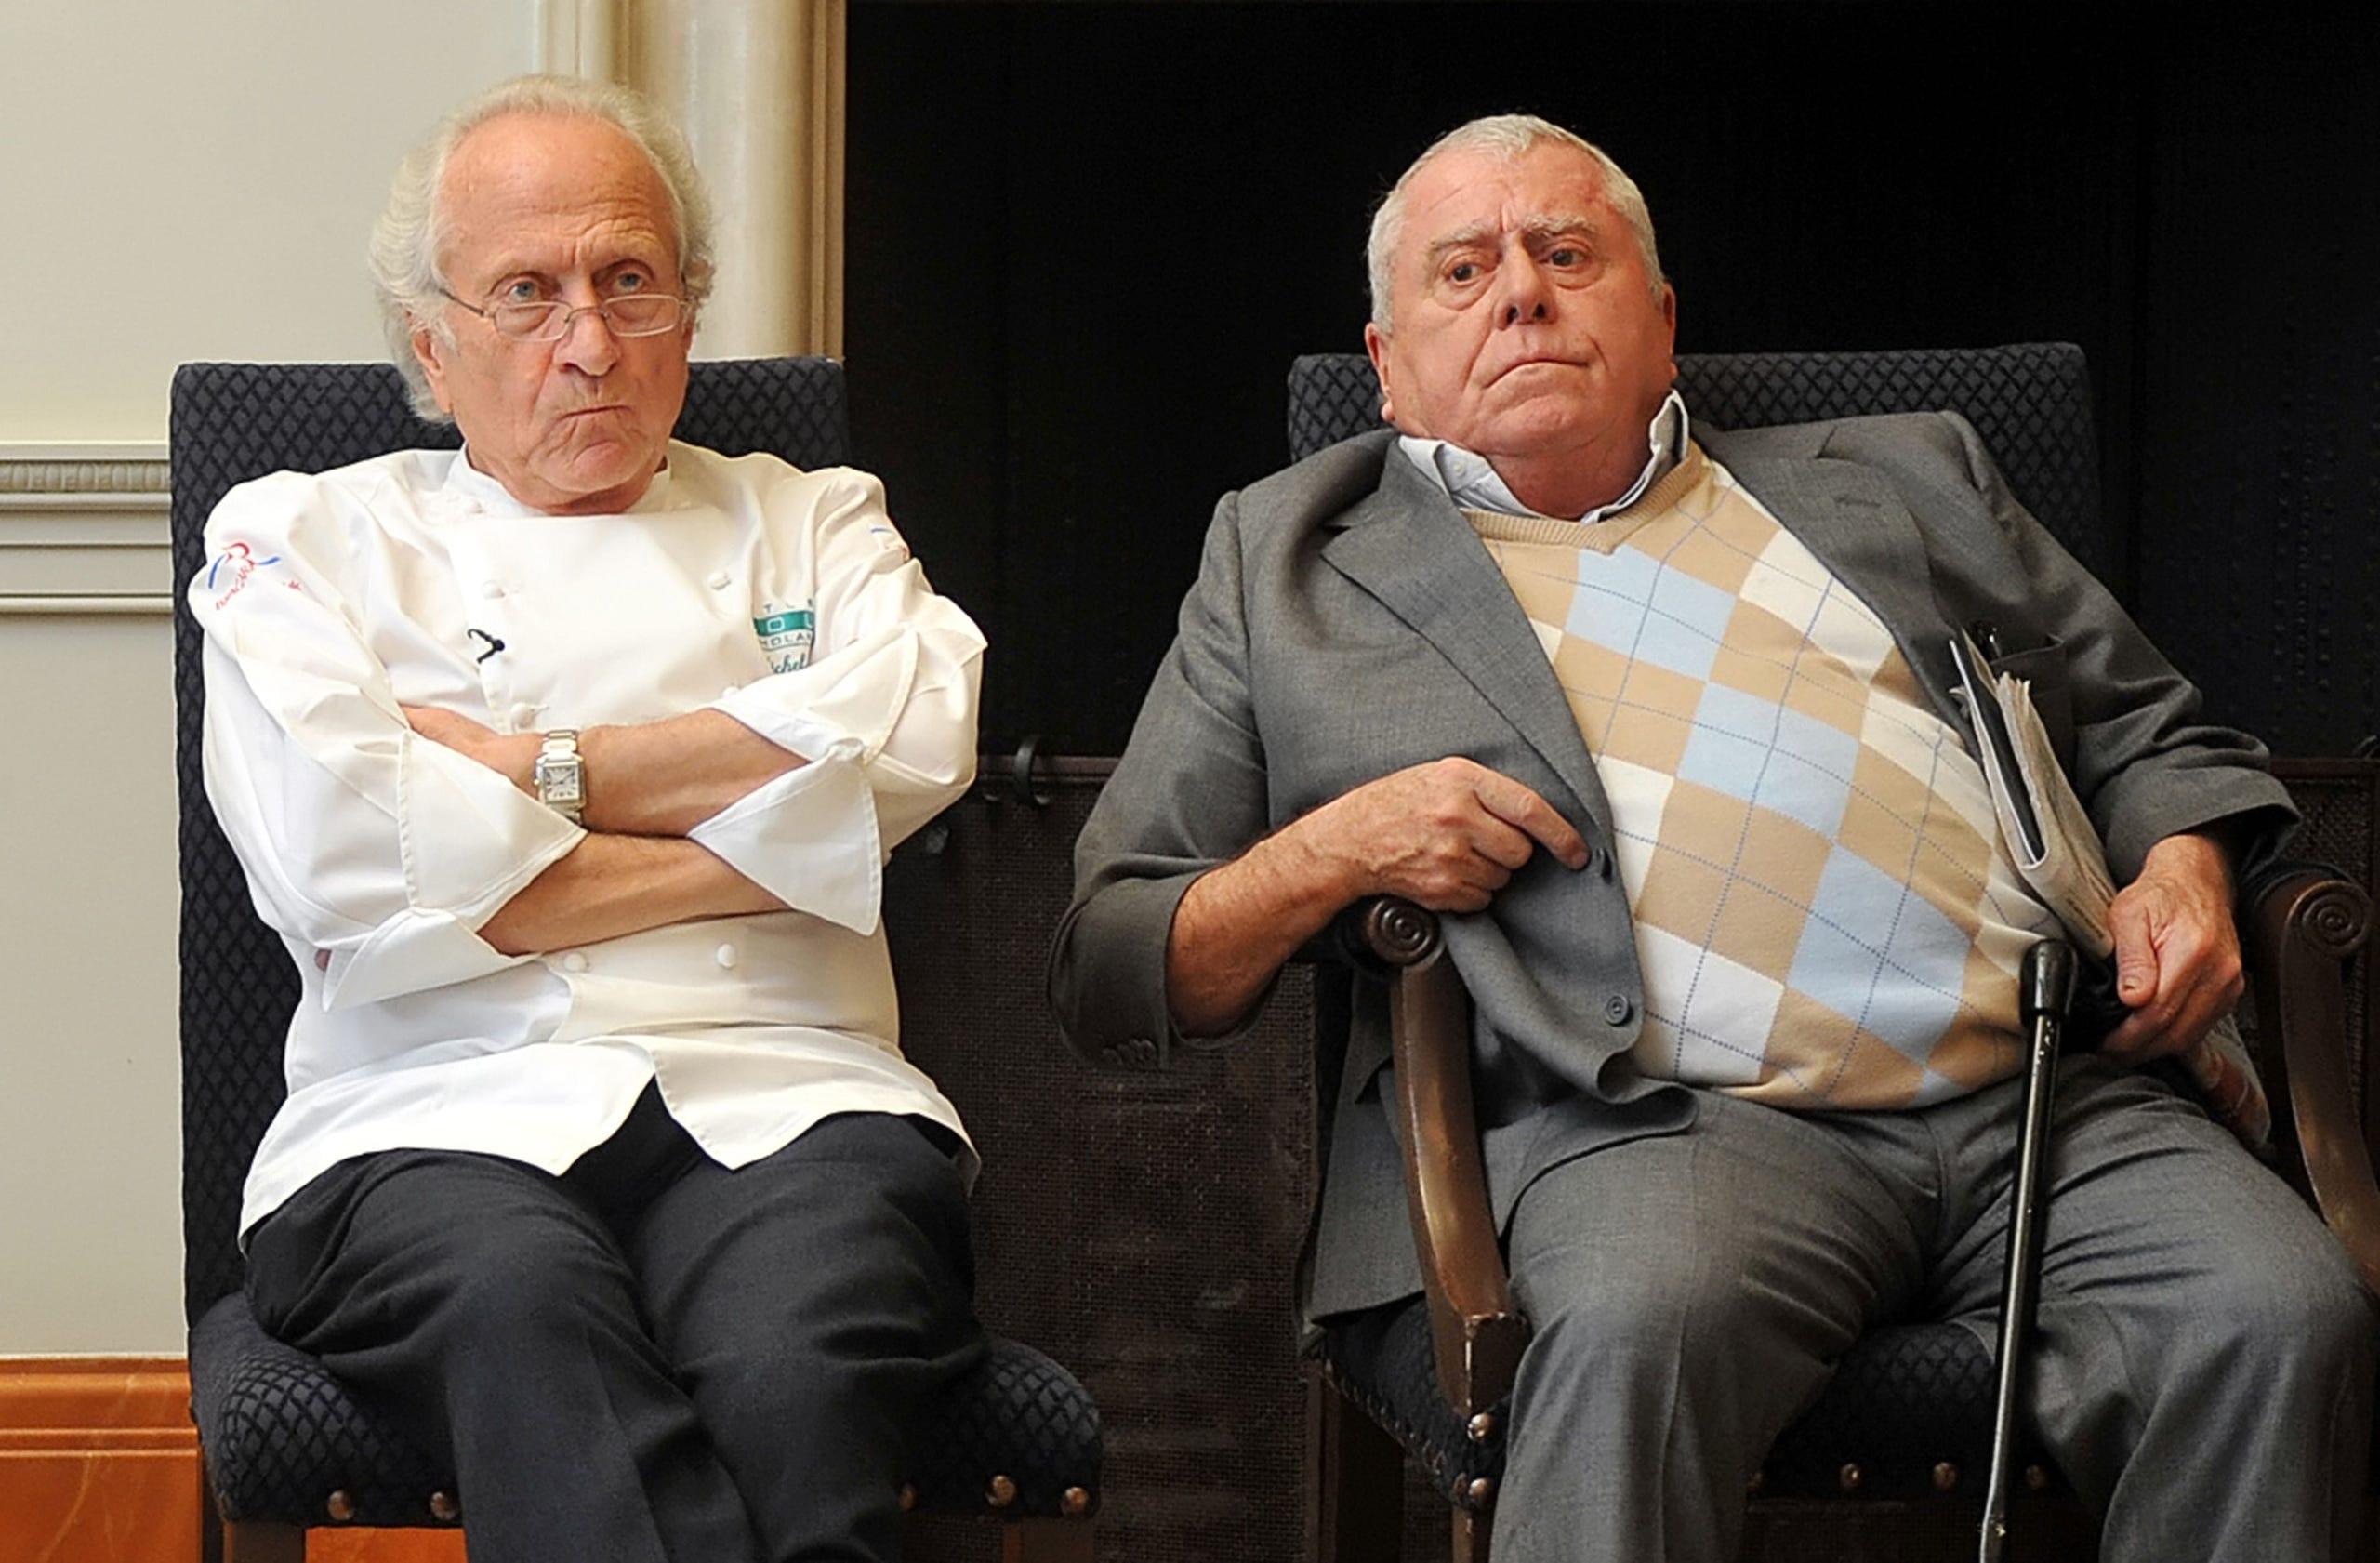 Michel and Albert Roux